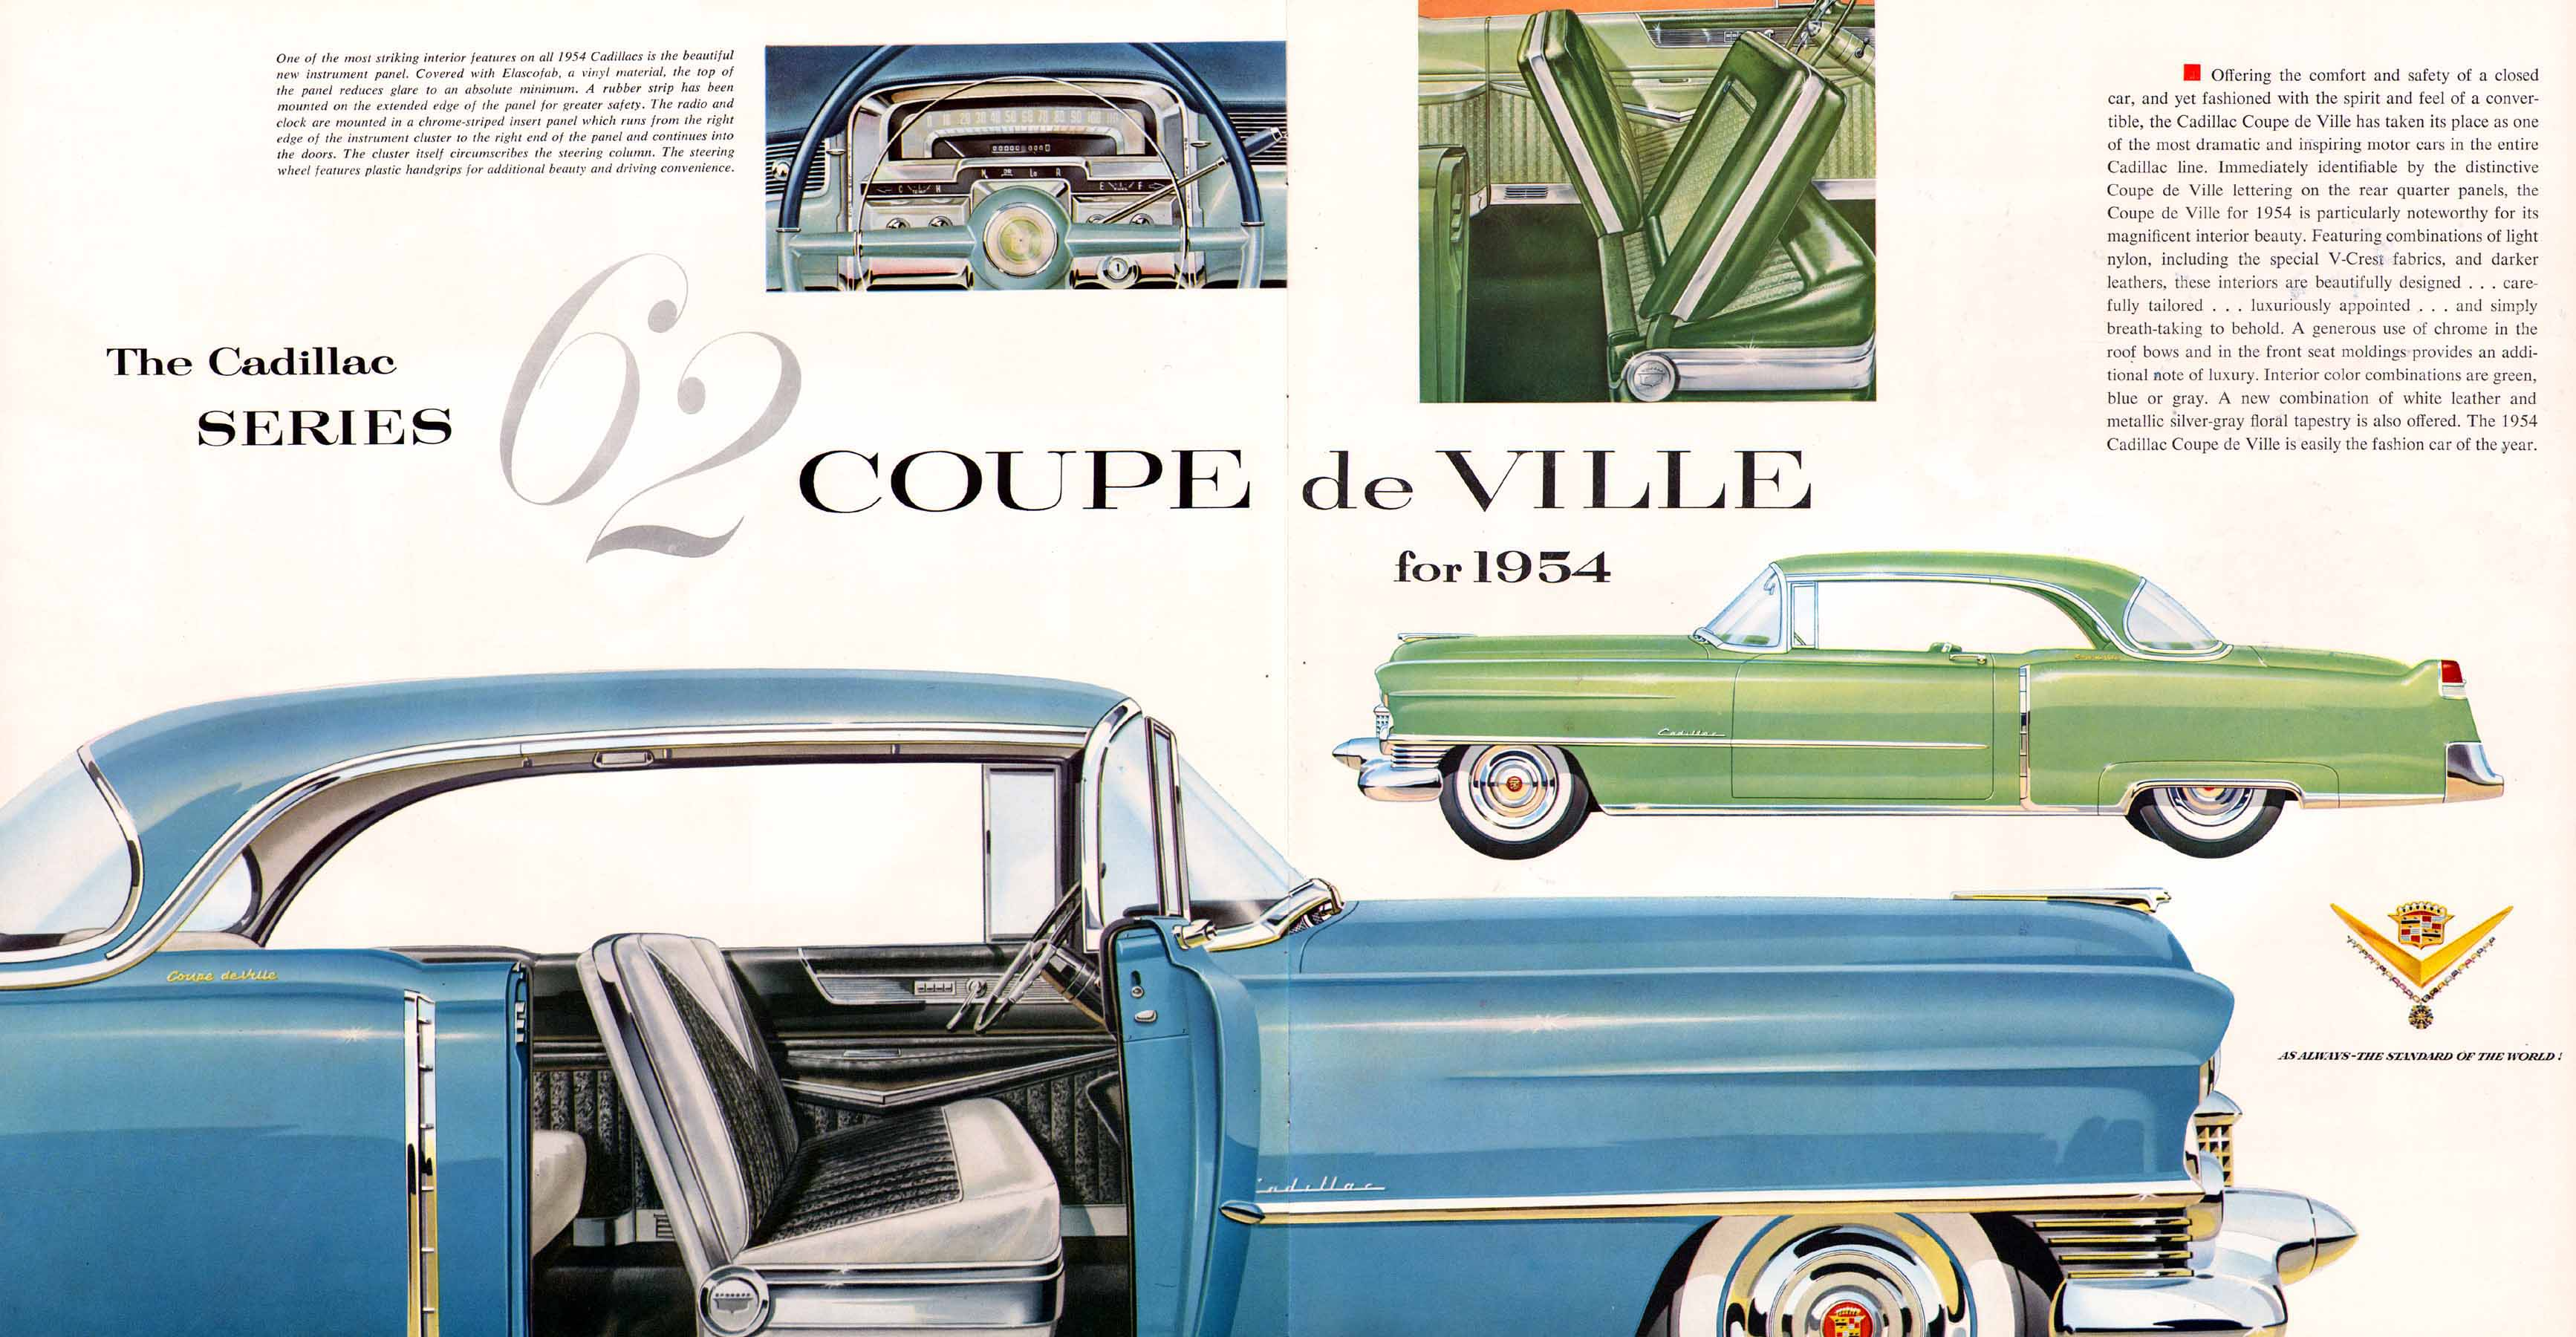 Old Car Dealers >> Image: 1954 Cadillac Brochure/1954 Cadillac Brochure-15-16